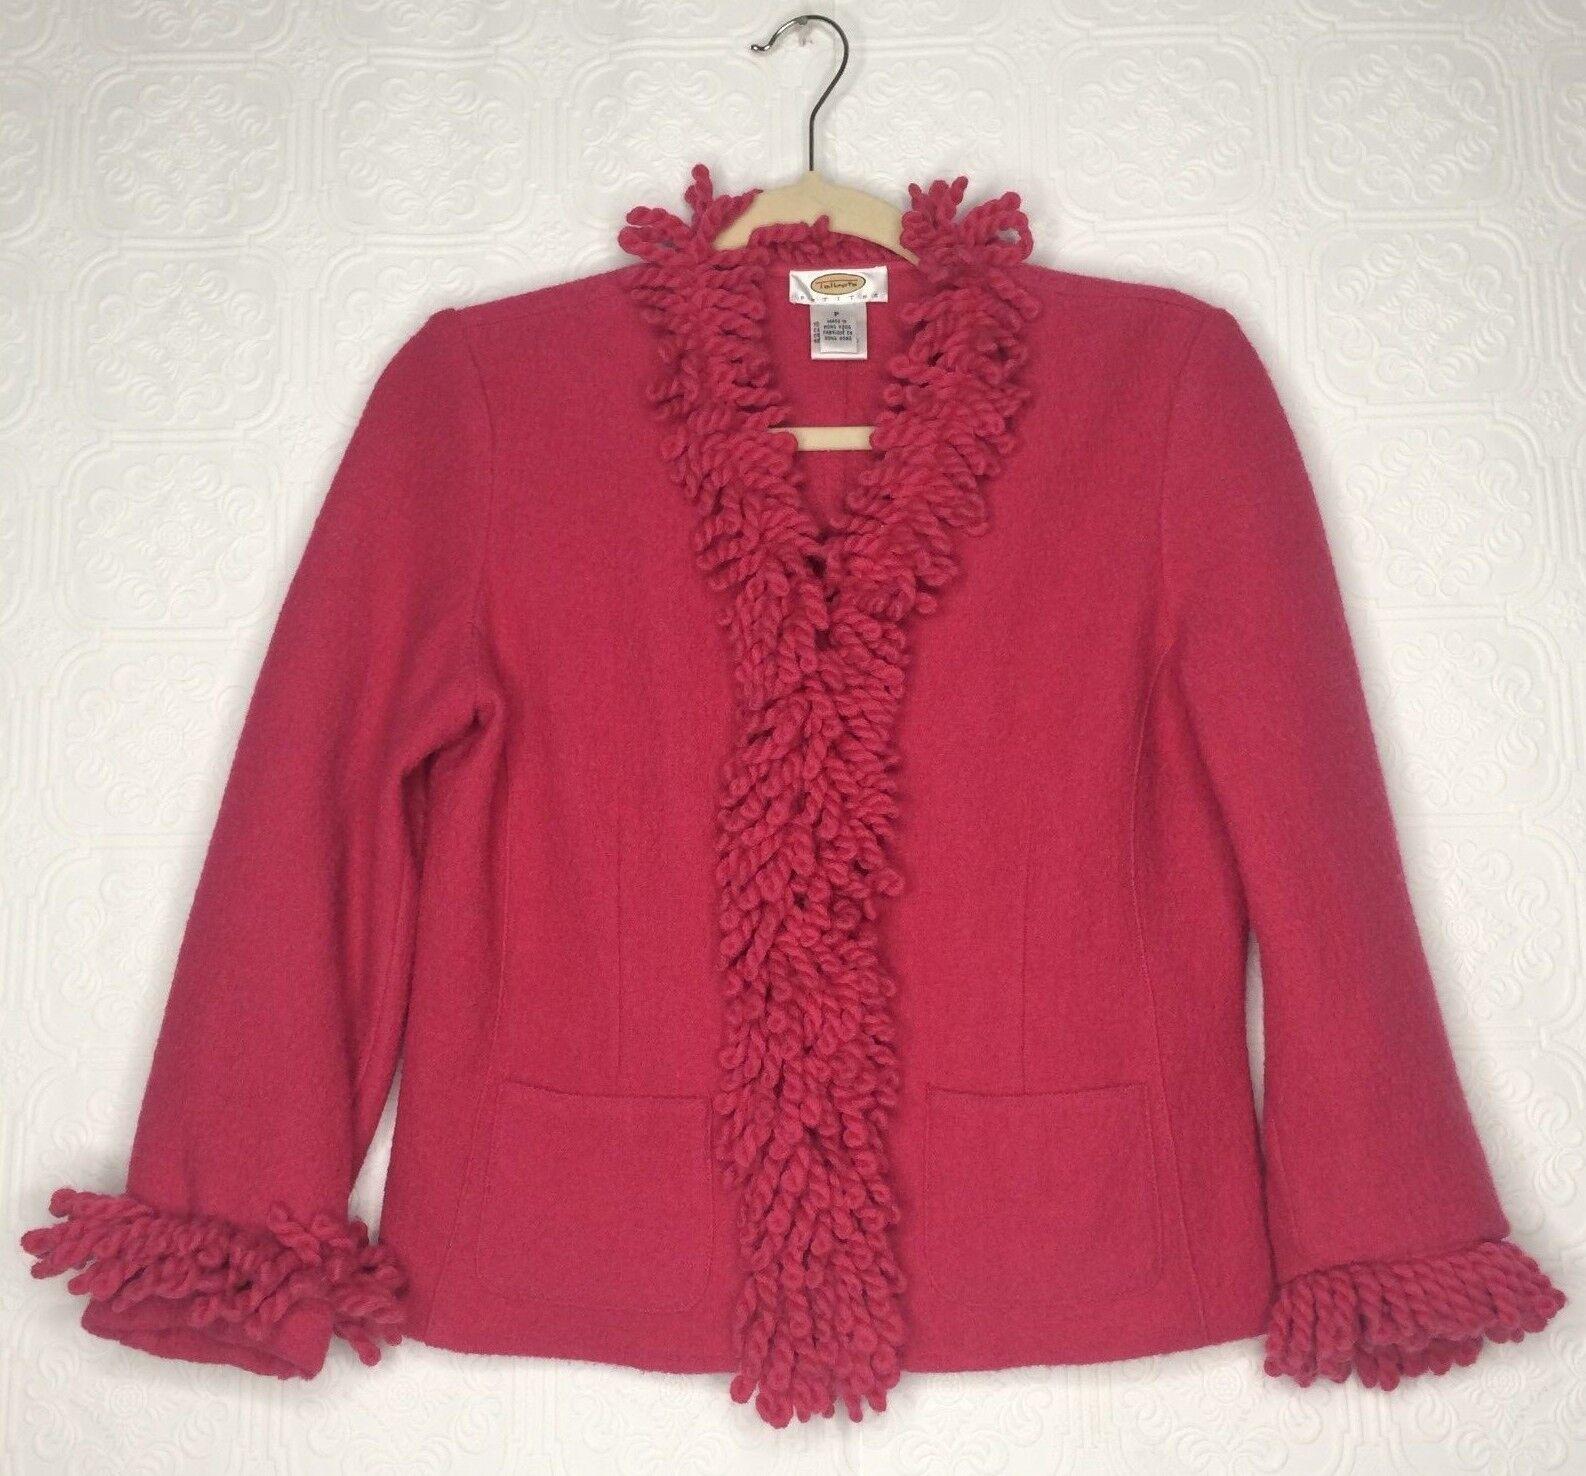 Talbots Petites Womens Pink Wool Cardigan Blazer with Fringe Detail Size P